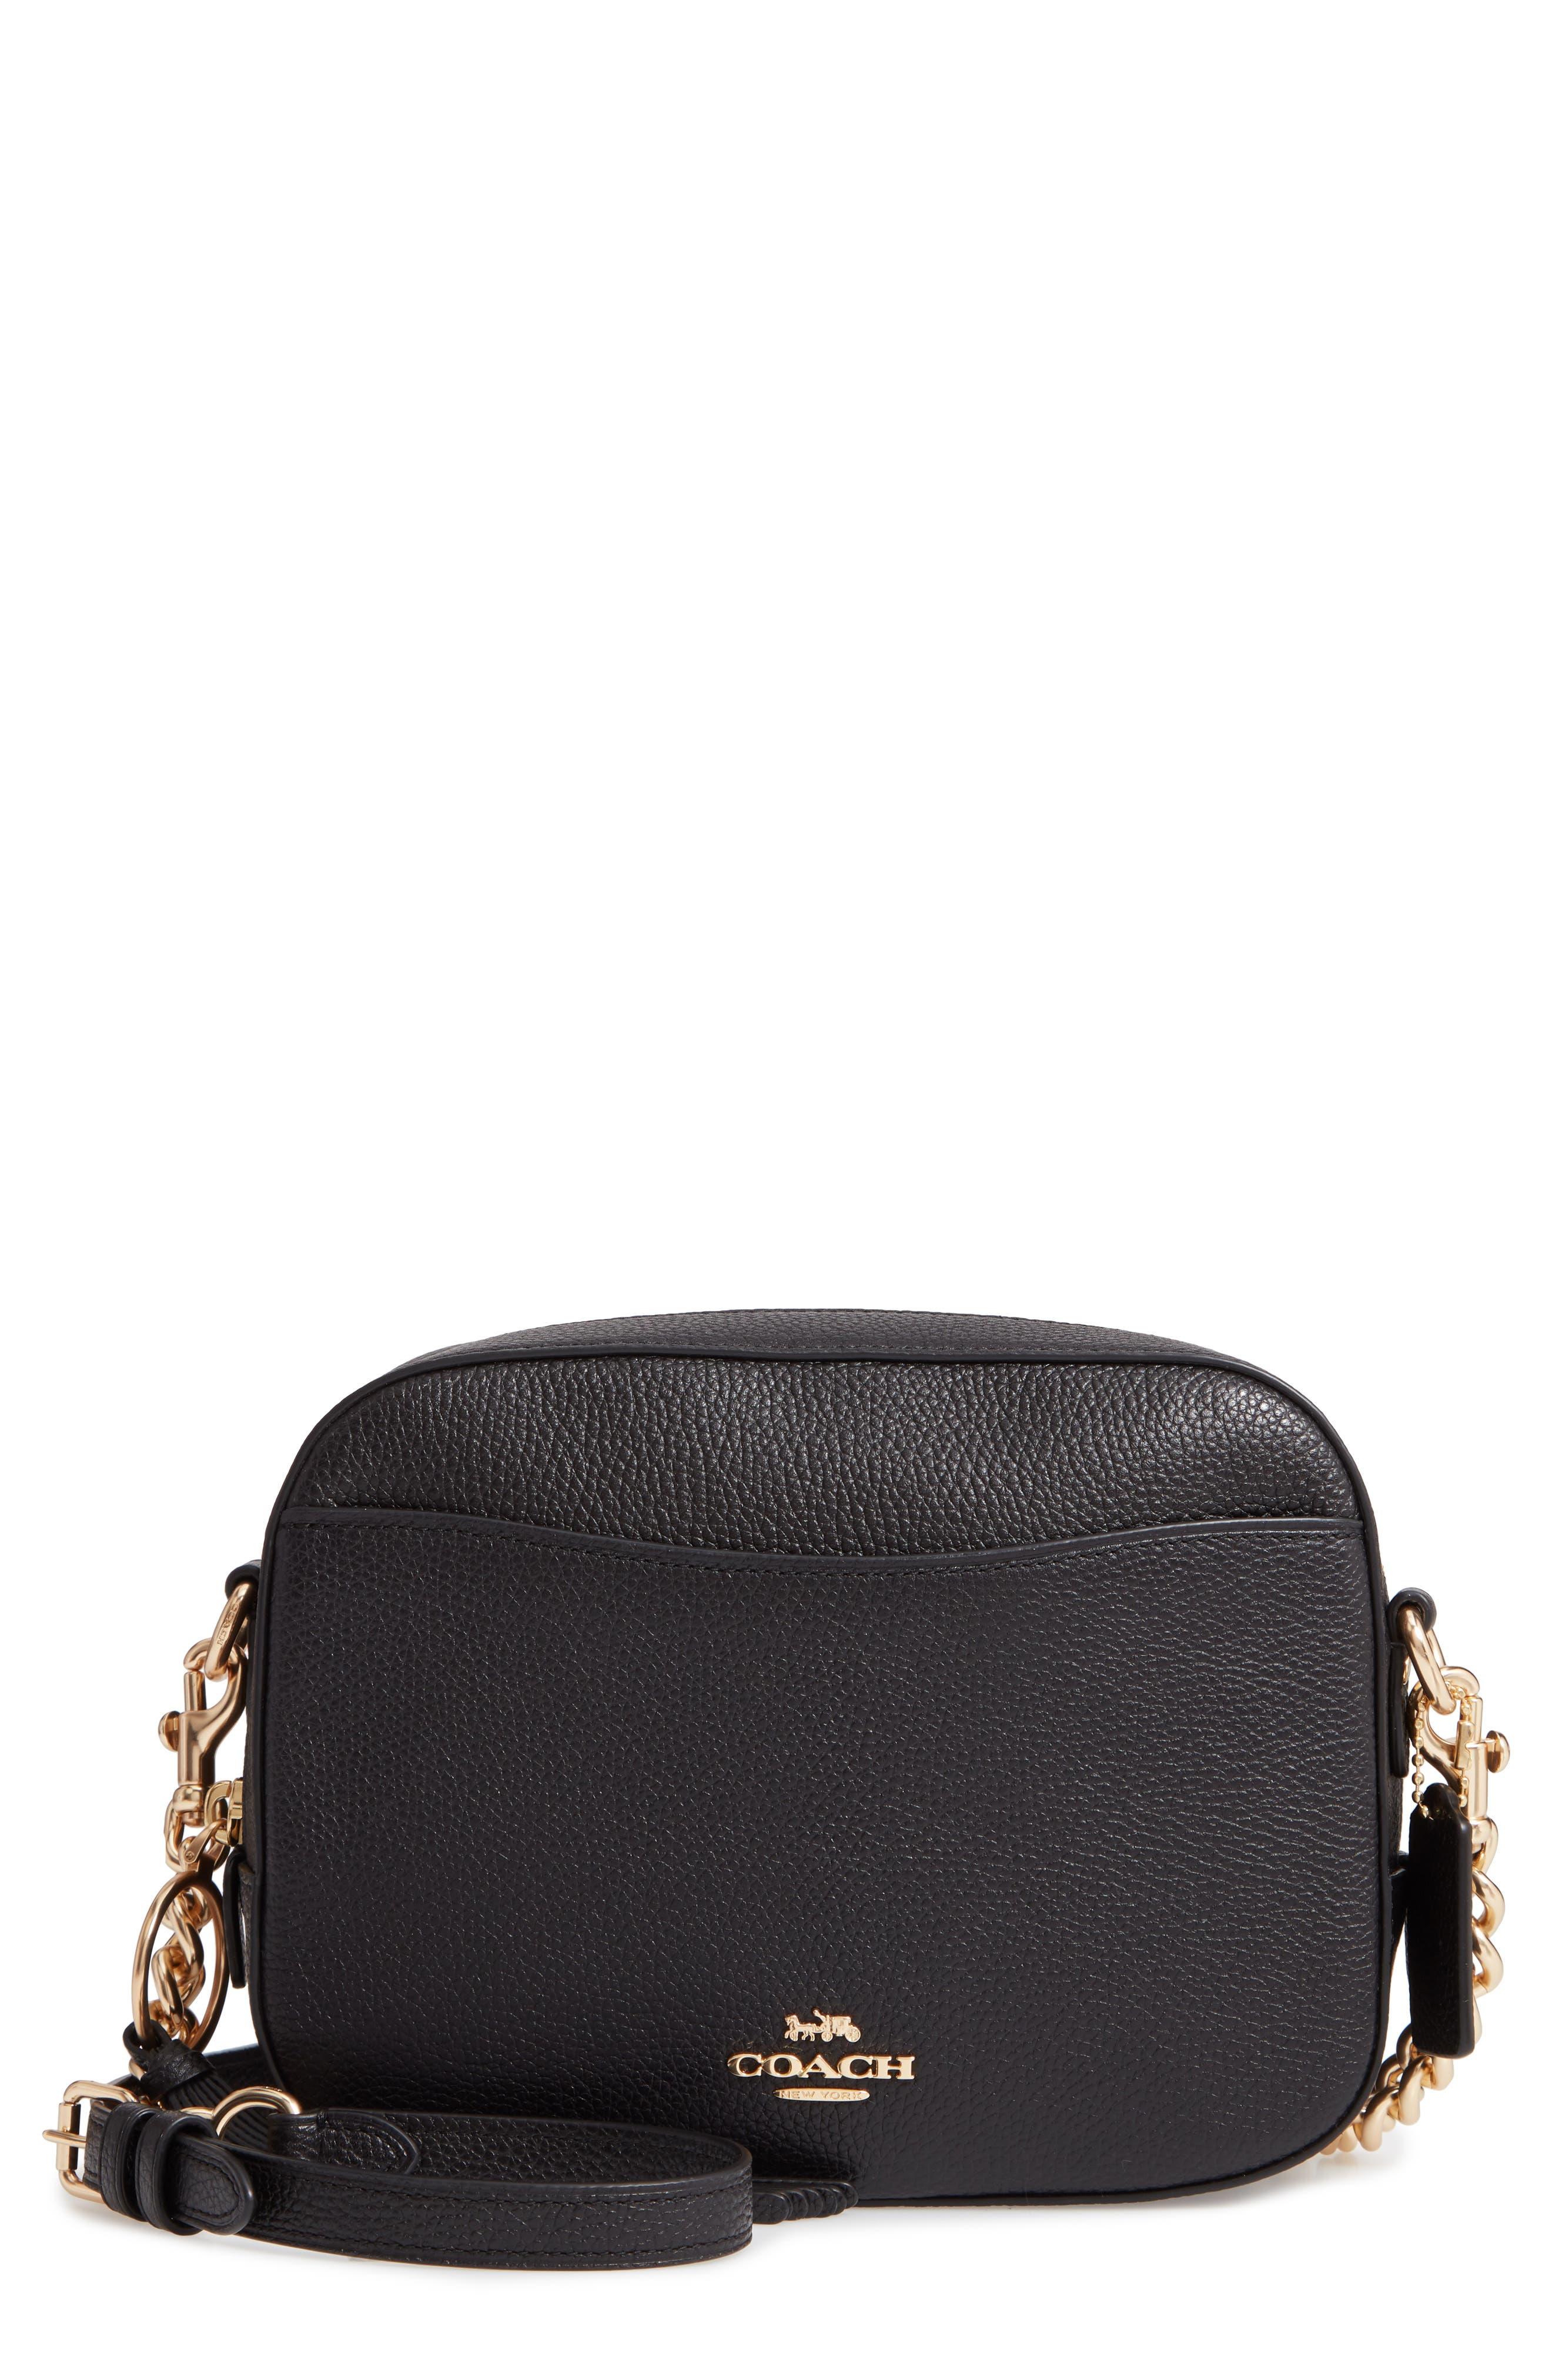 COACH, Pebbled Leather Camera Bag, Main thumbnail 1, color, BLACK